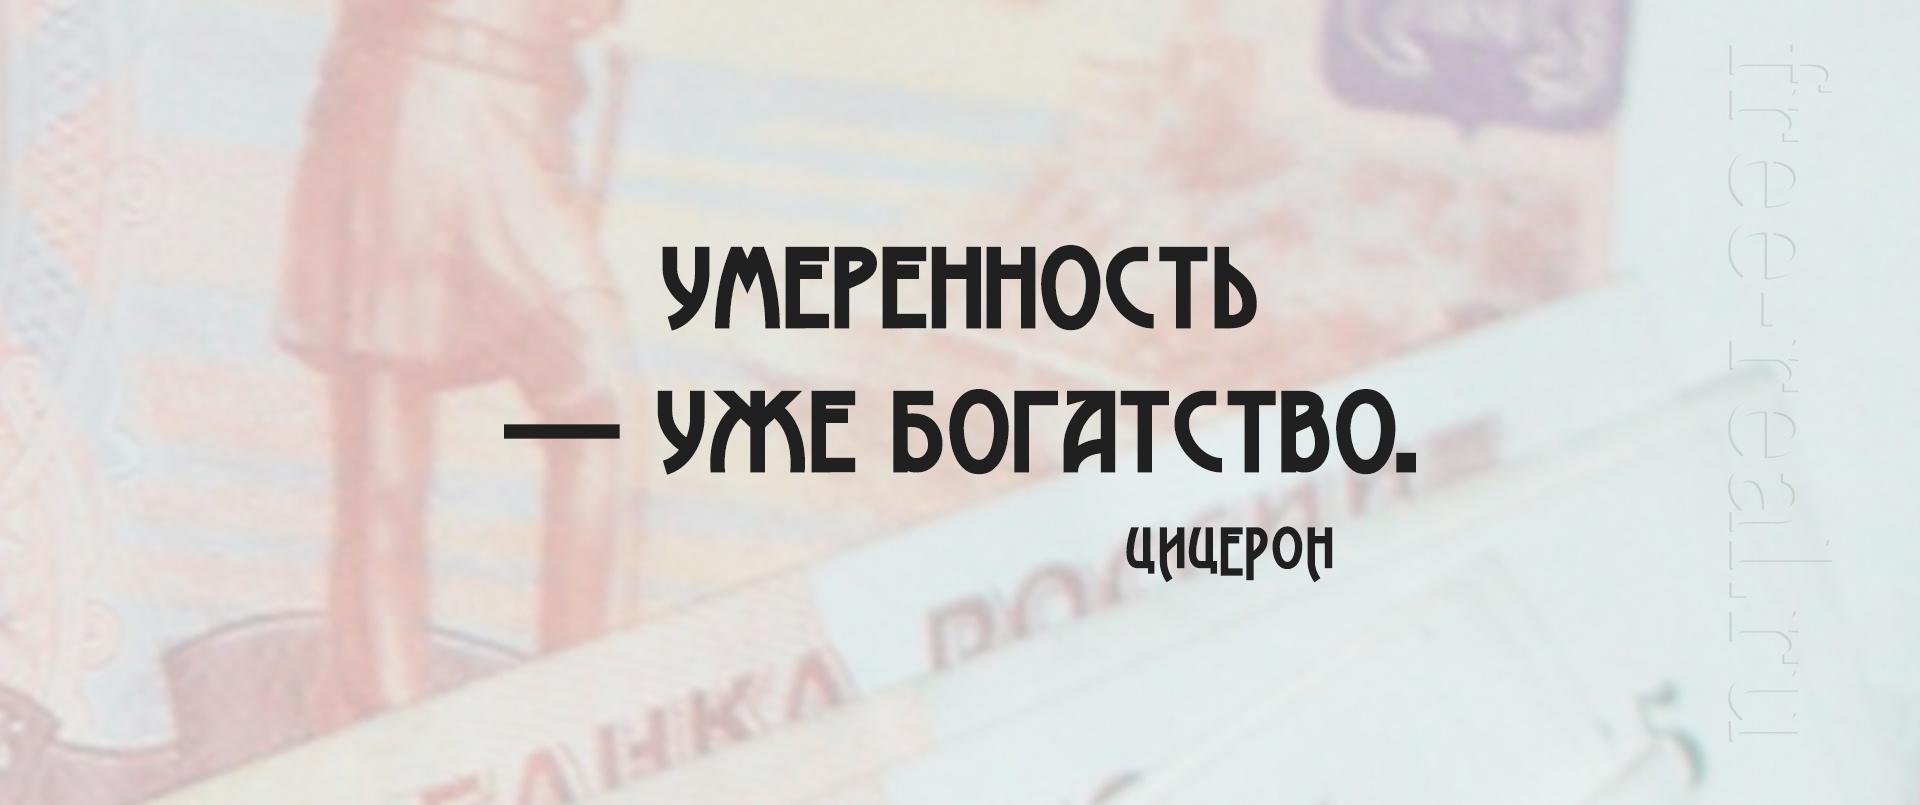 цицерон, цицерон цитаты, цитаты о богатстве, цицерон о богатстве, картинки о богатстве, мотивирующие фото